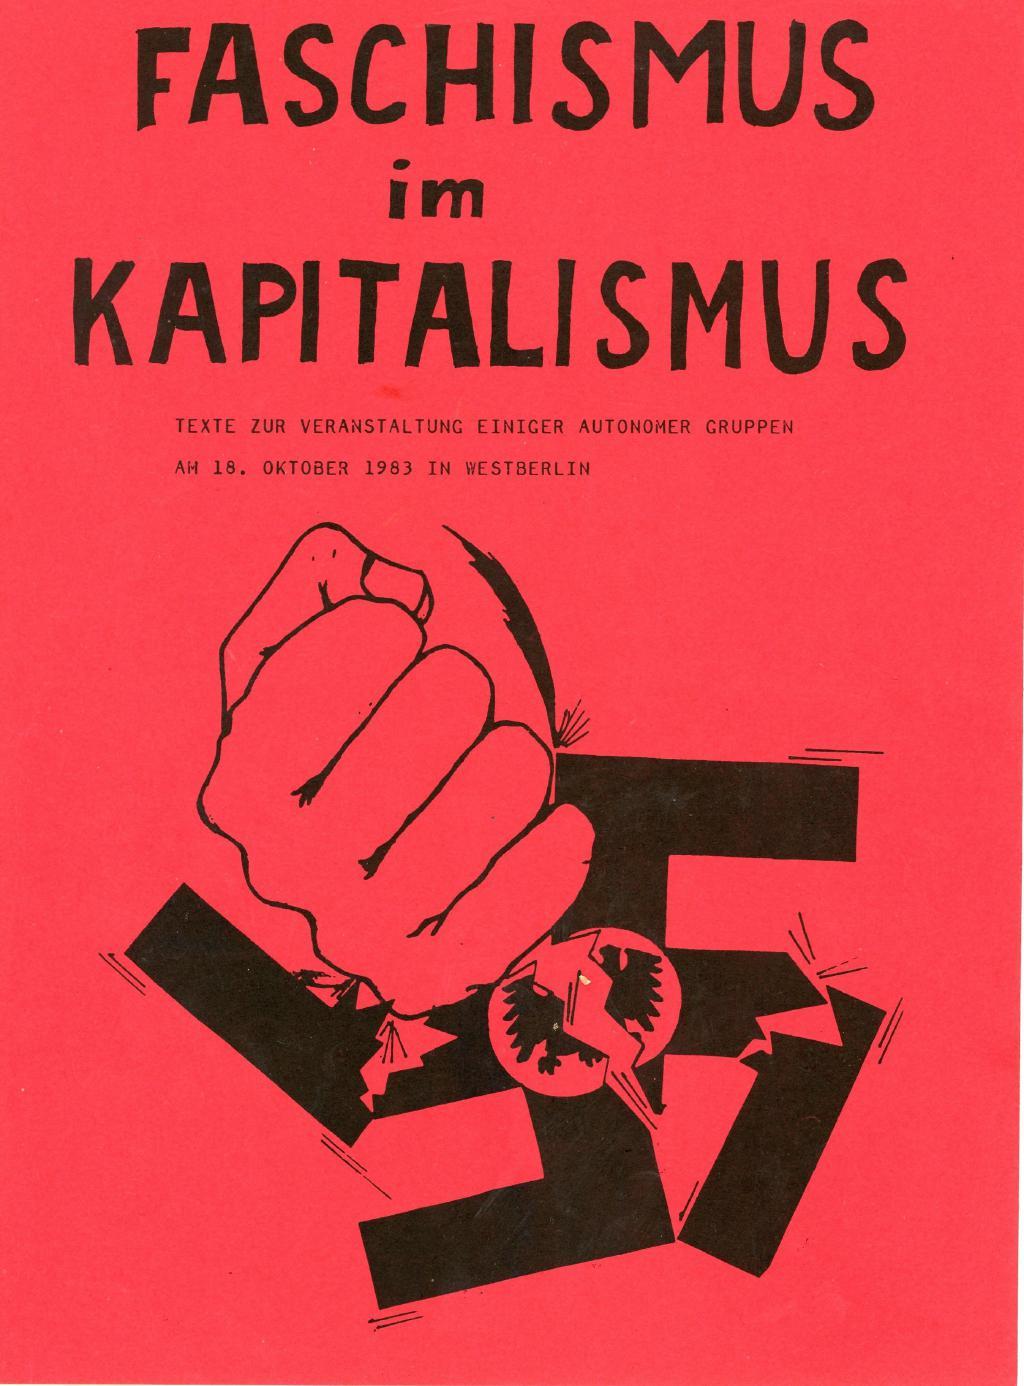 Berlin_1983_Autonome_Gruppen_Faschismus_im_Kapitalismus_01